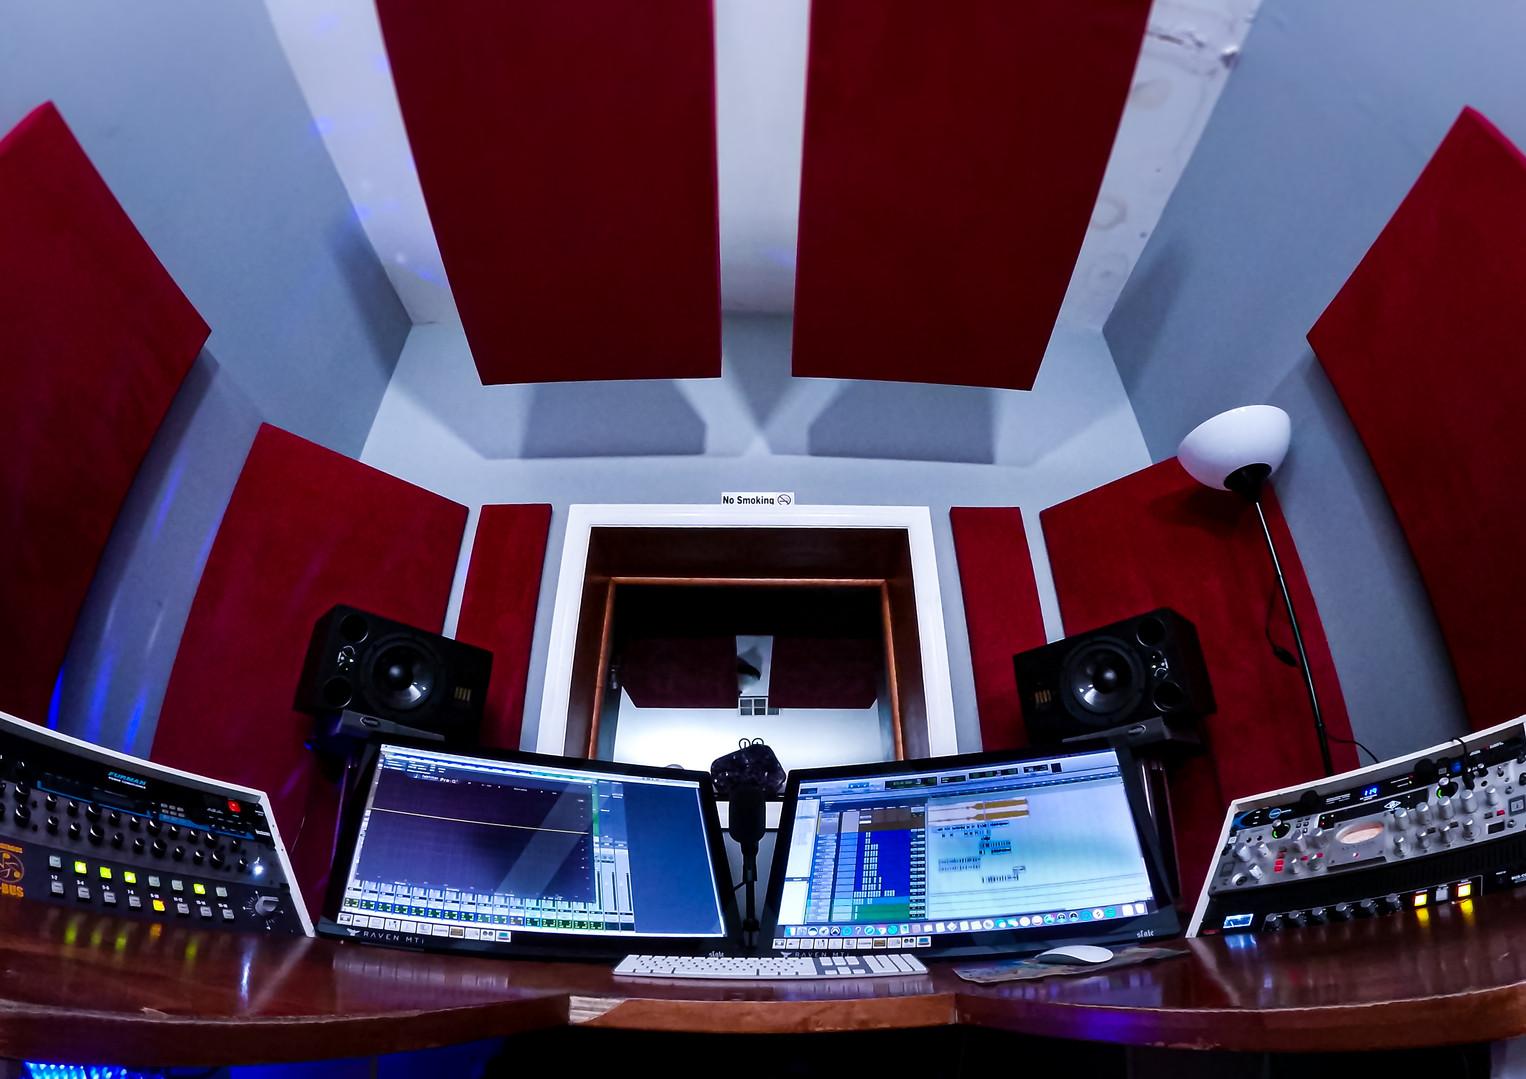 studio b edited.jpg